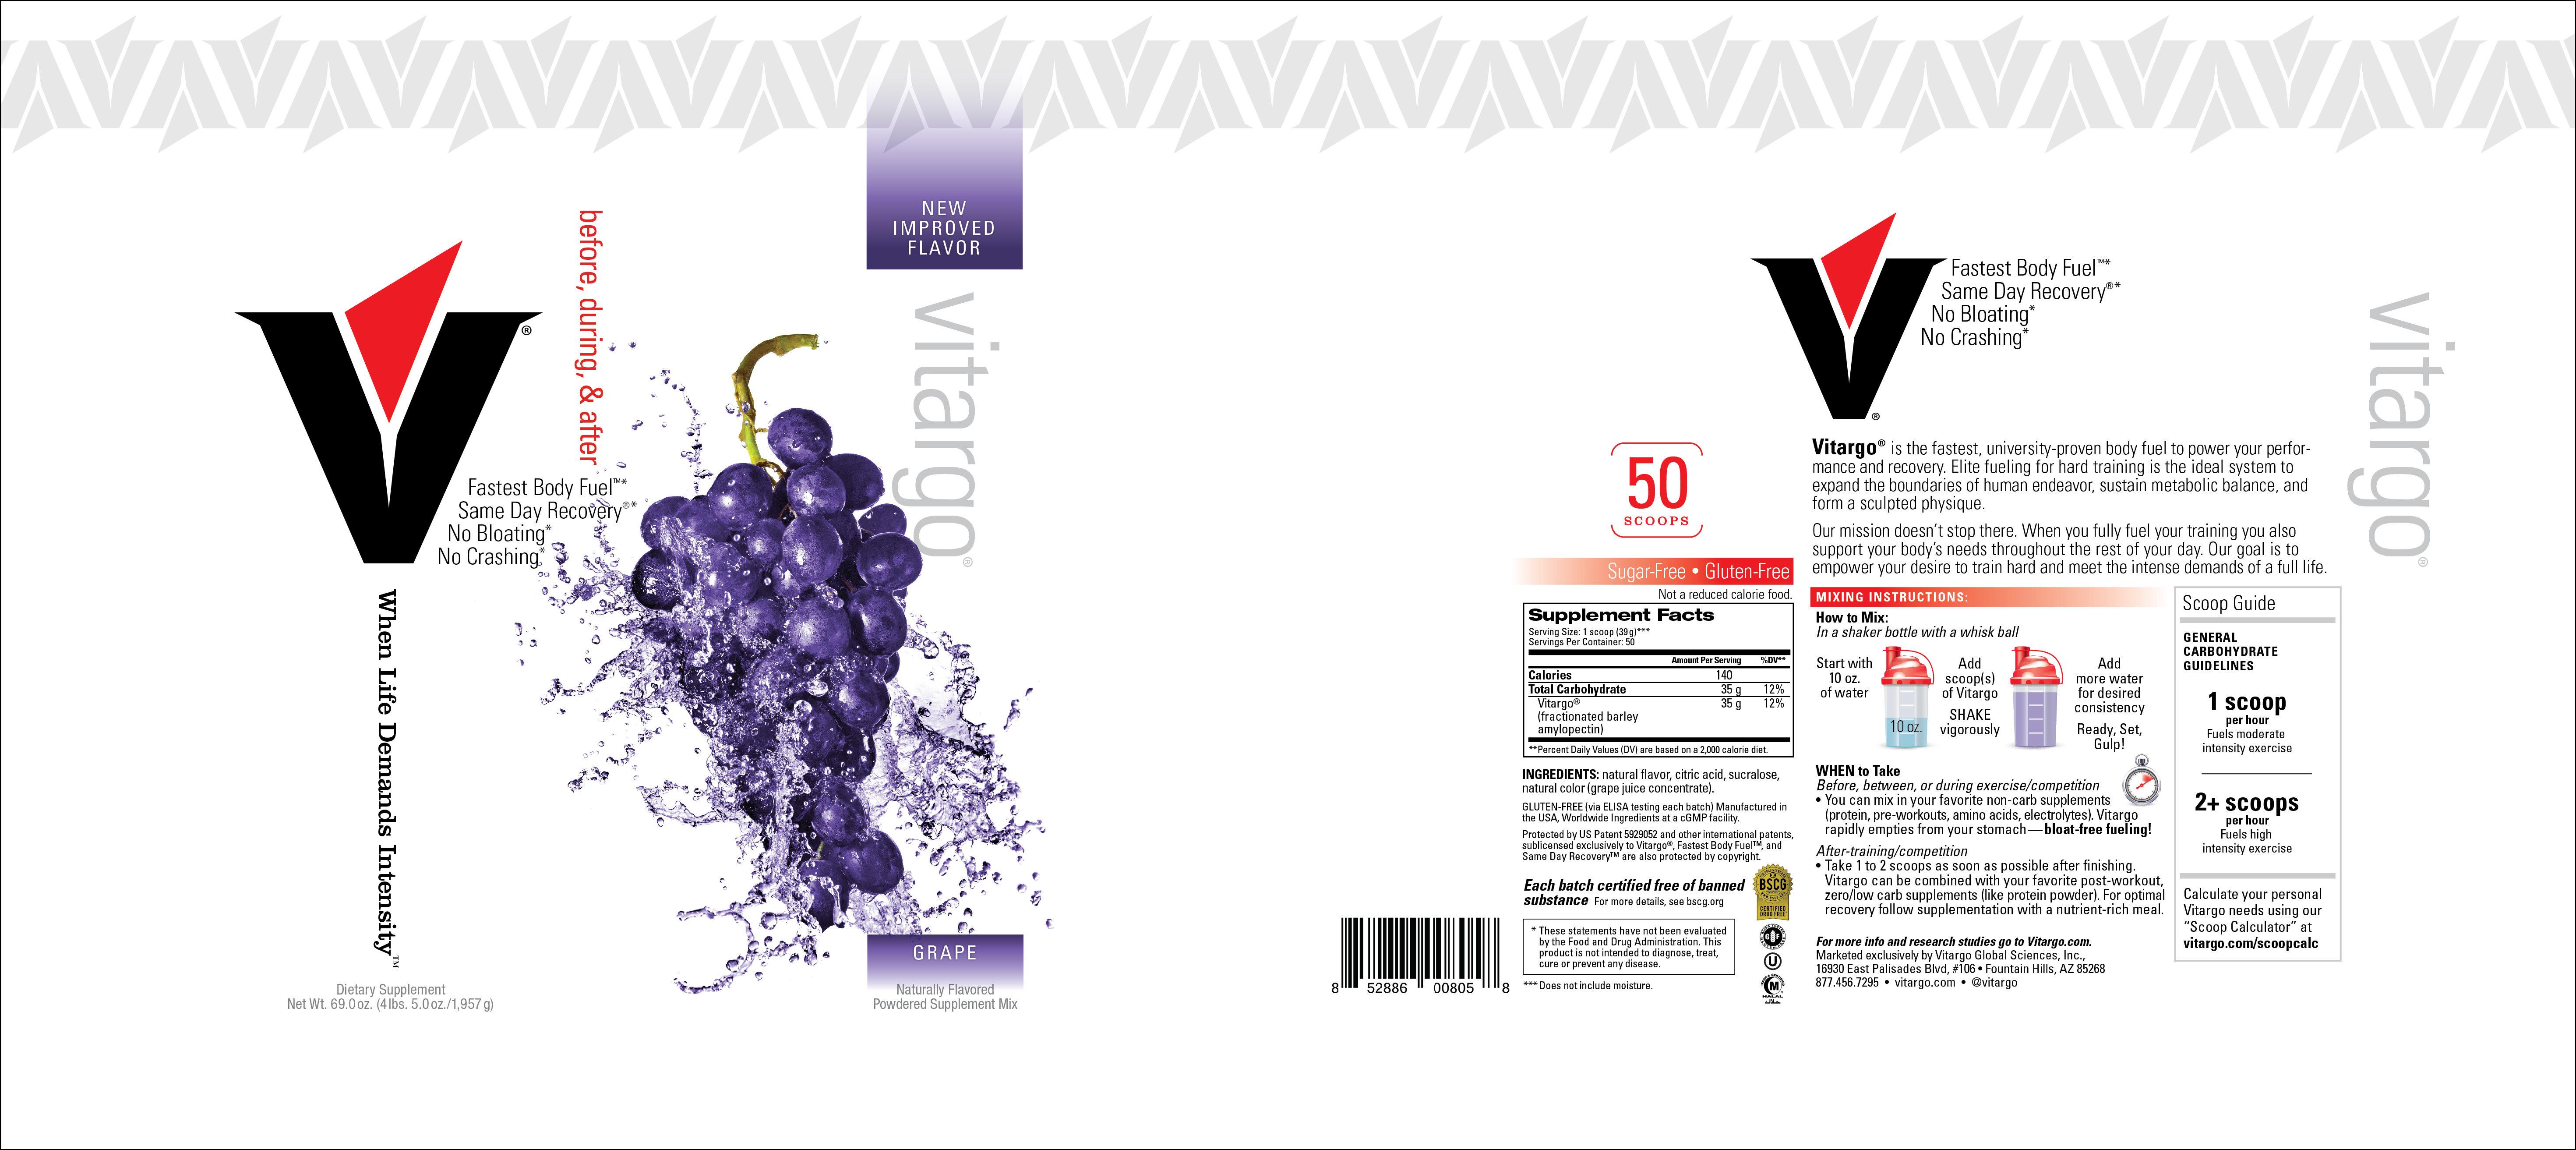 Grape 20 Scoop Label